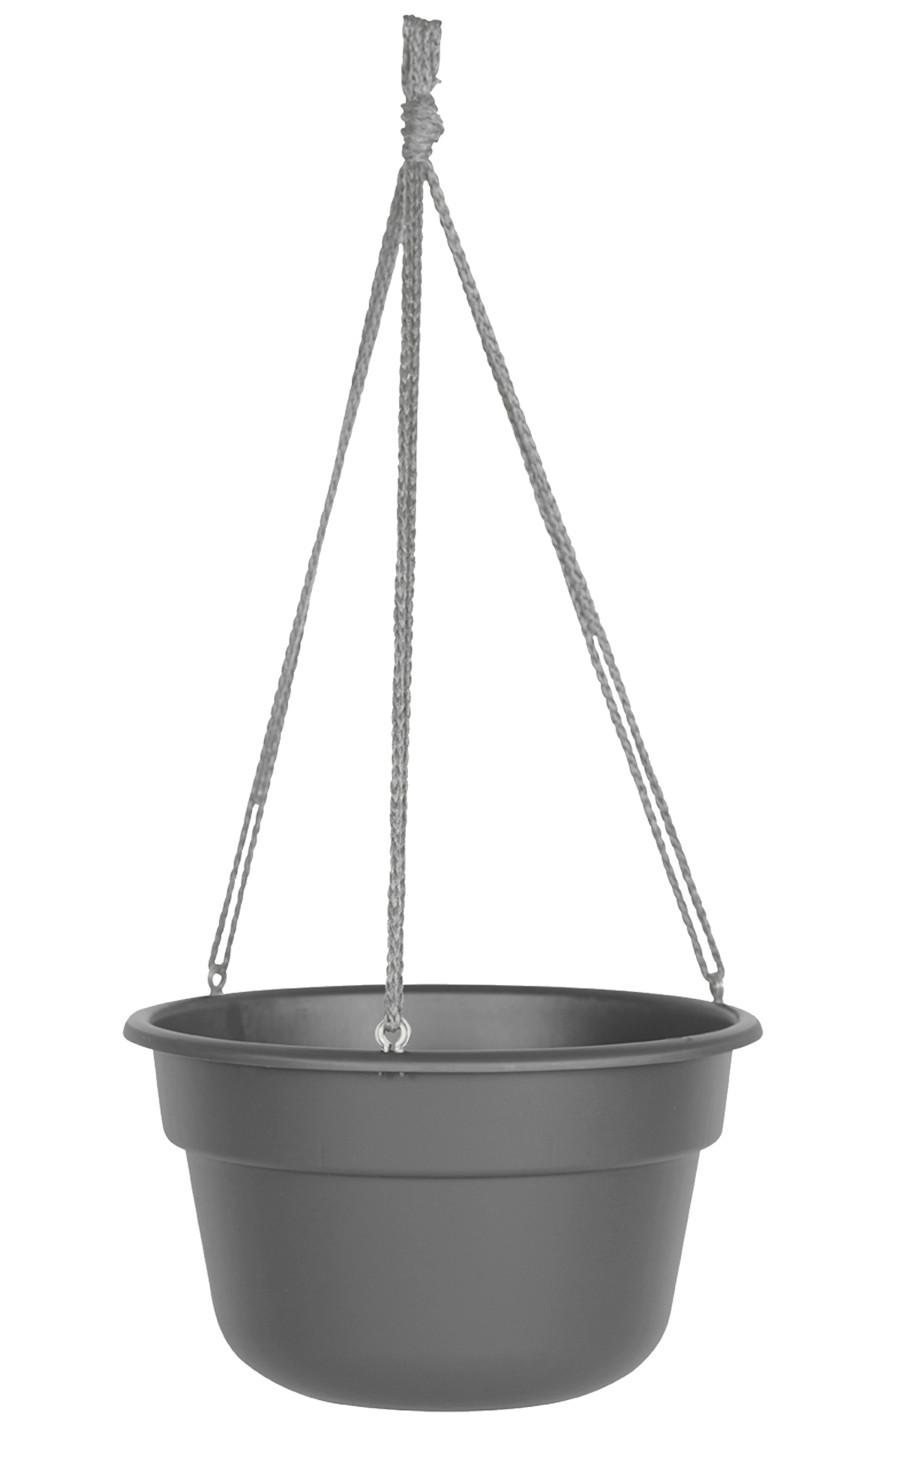 Bloem Dura Cotta Hanging Basket Planter Charcoal 12ea/12 in